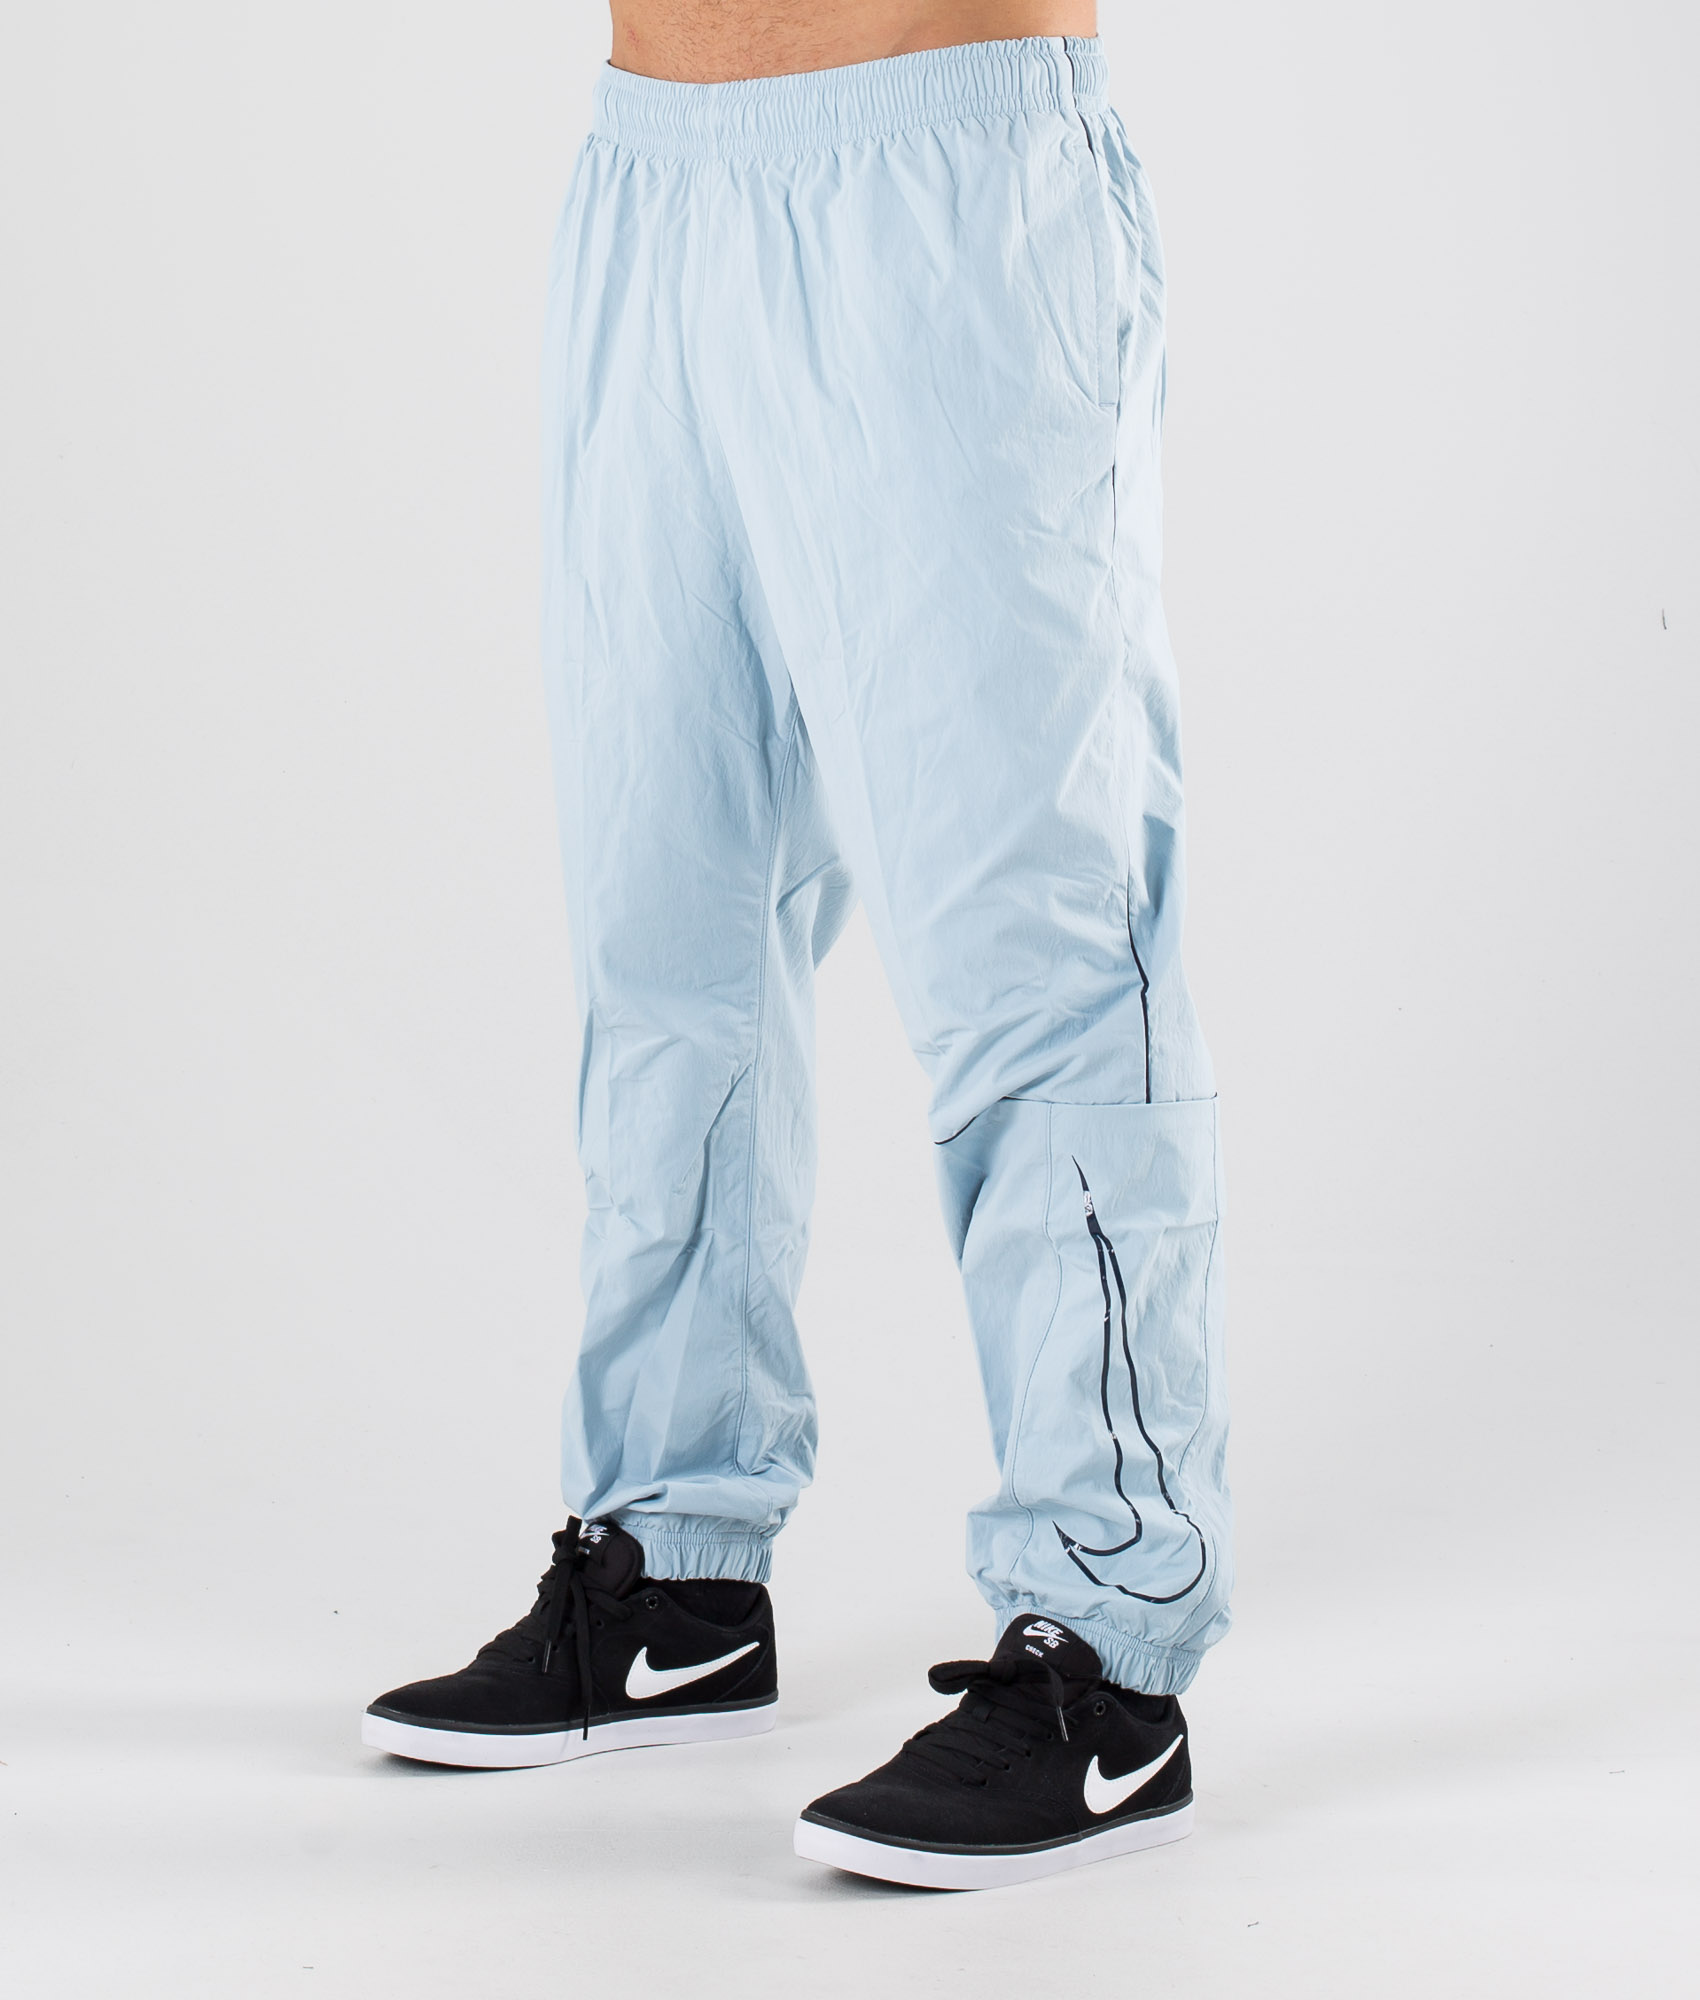 Nike Swoosh Armory Lt SB Pant Track BlueObsidianObsidian Hosen W9EDHI2